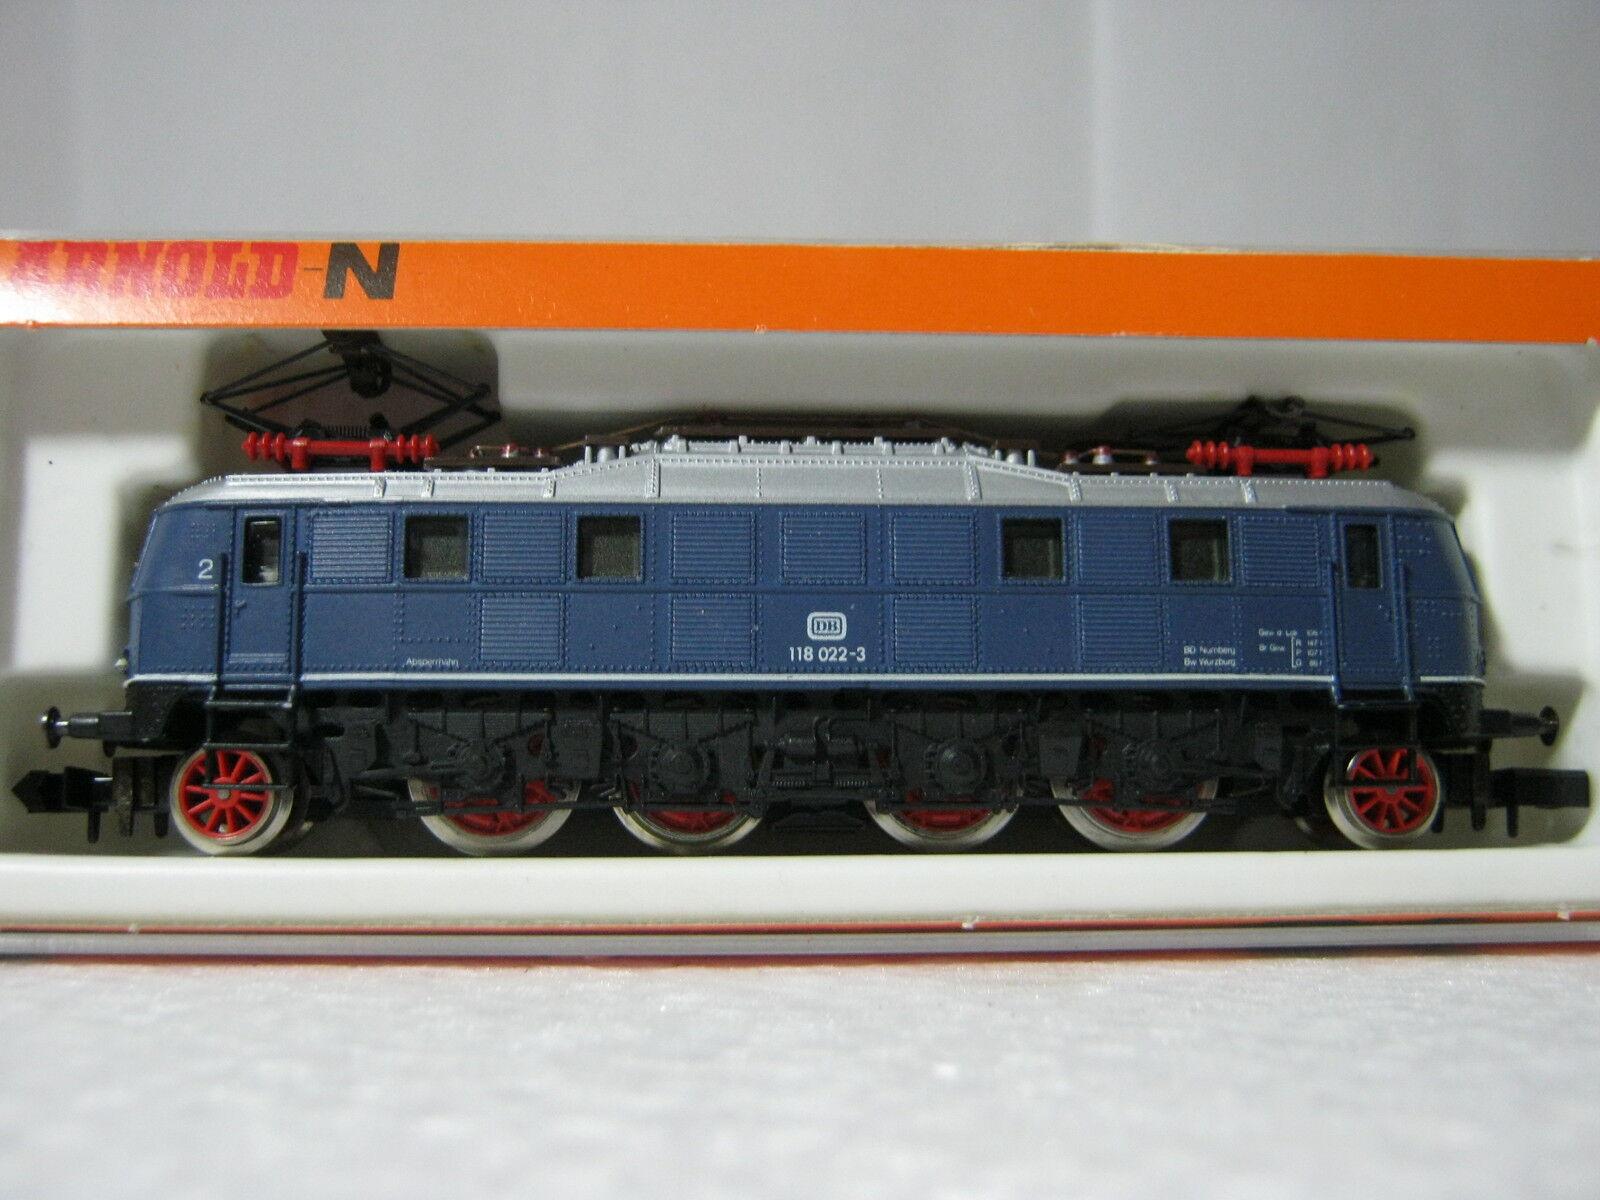 Arnold N 2355 Elektro Lok BTR. n. 118 022 - 3 DB BLU  rg/70s5-074  001